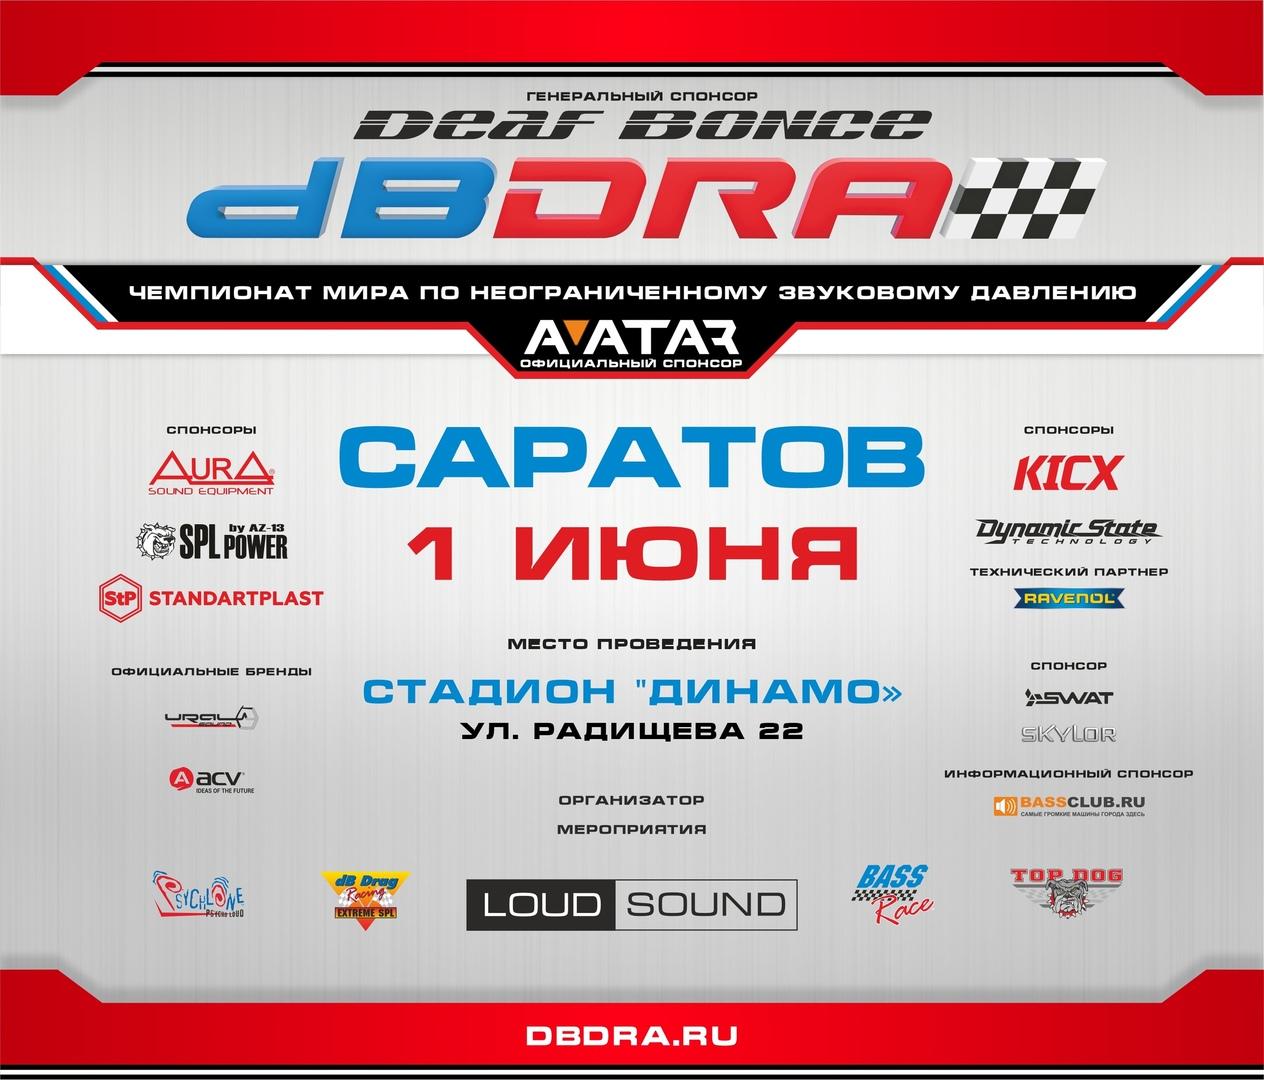 Афиша db Drag Racing Saratov